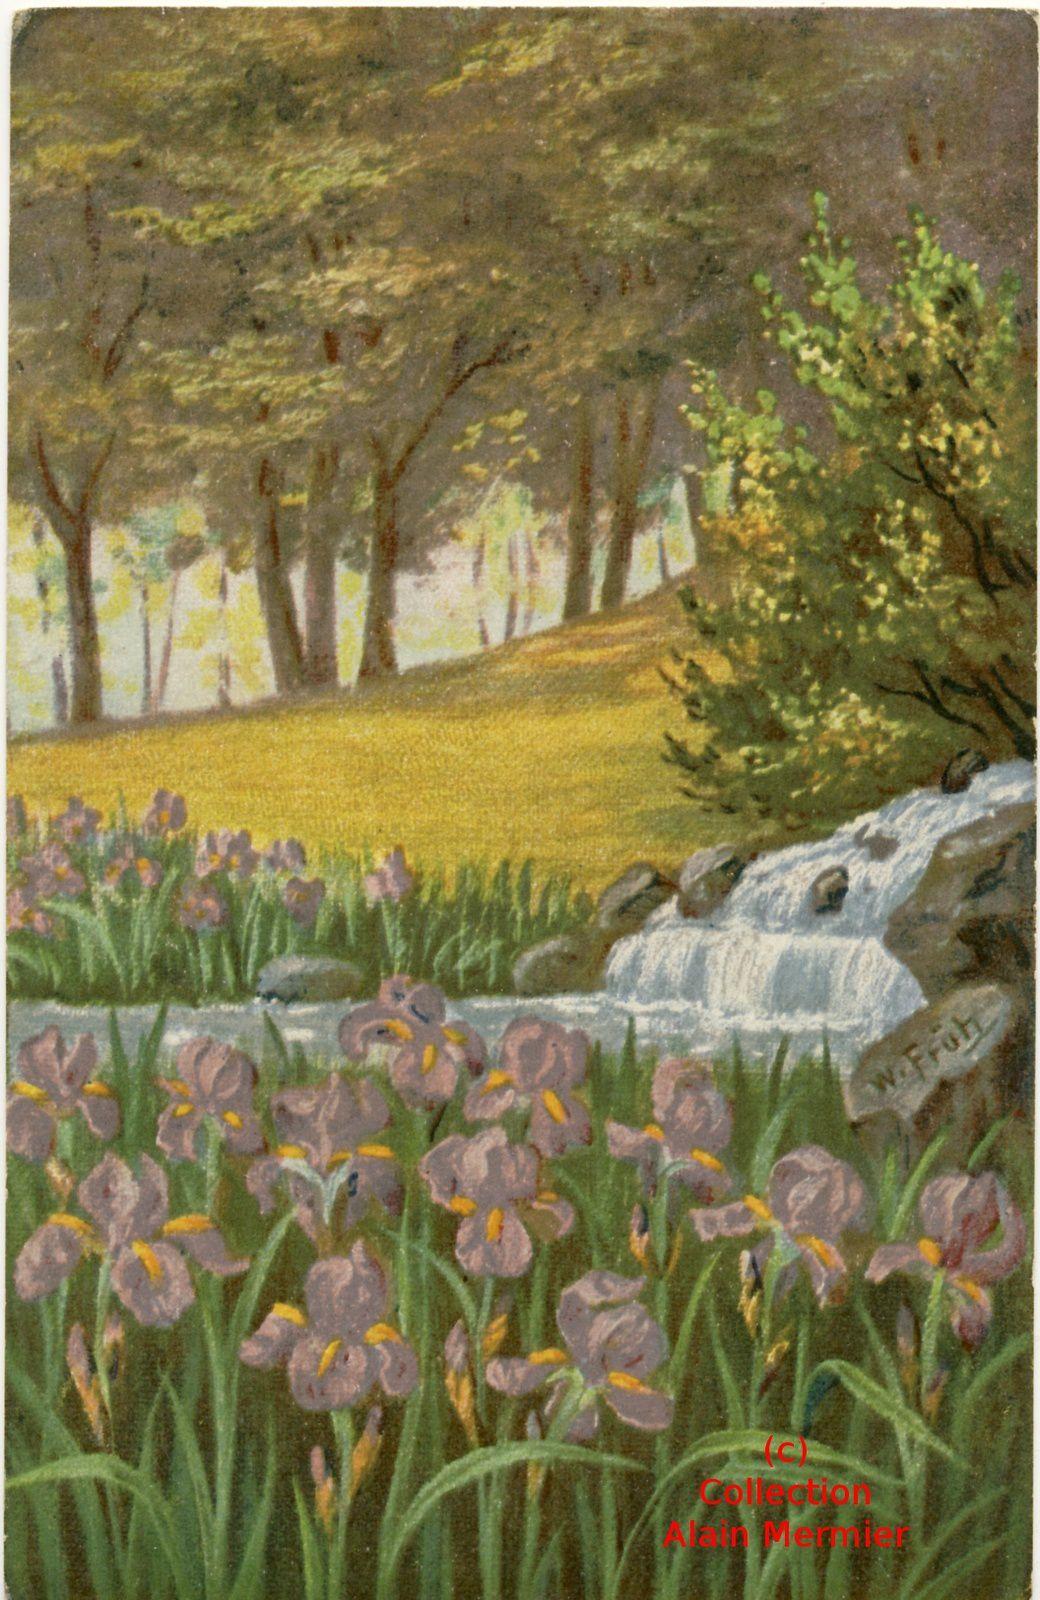 Iris -1867- Illustrateur FRÜH W. Cascade et iris. Allemagne. 1924.